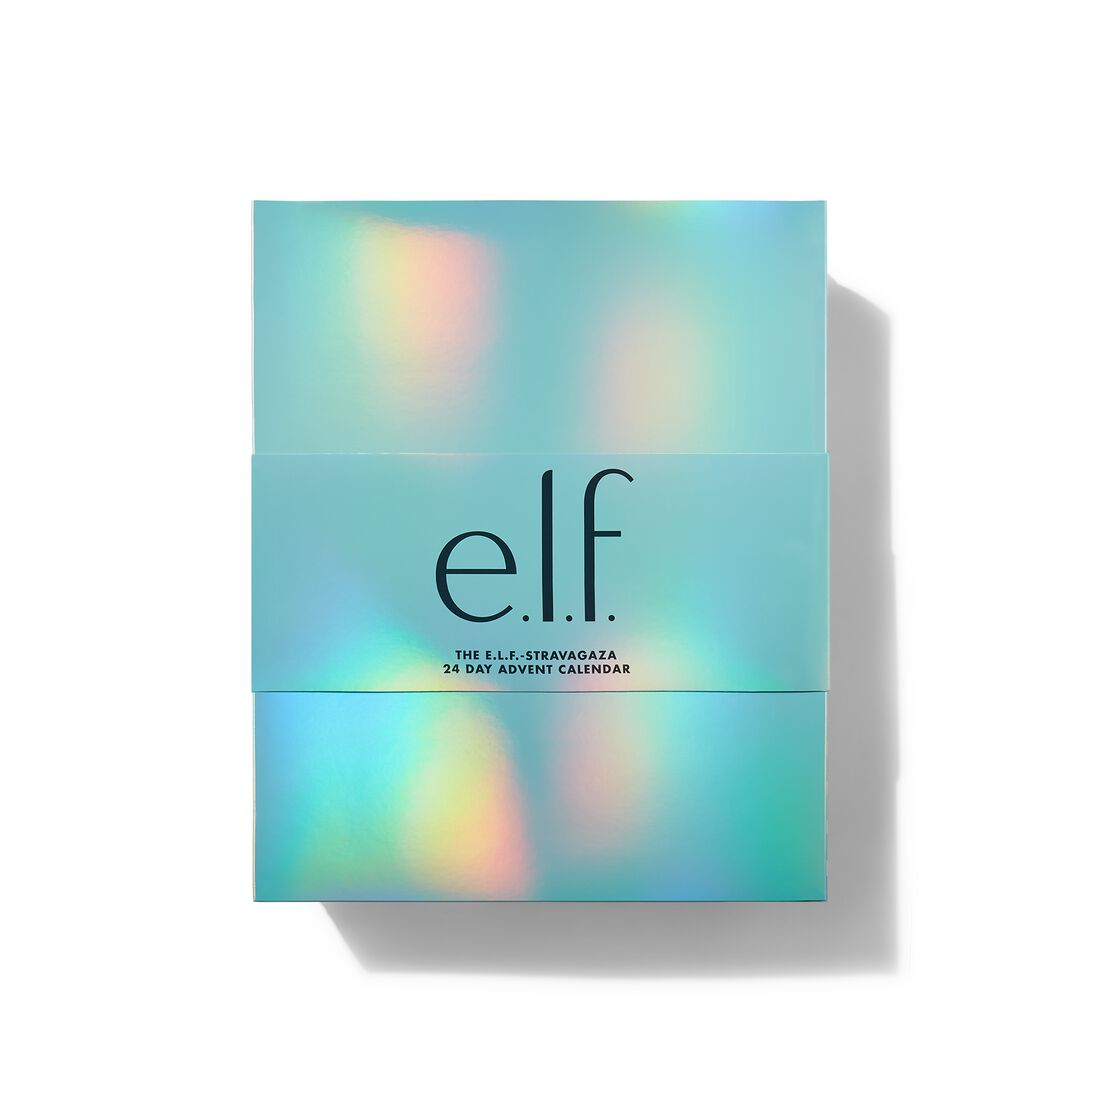 ELF The ELF-Stravaganza 24 Day Advent Calendar 2020 Contents Reveal (4)